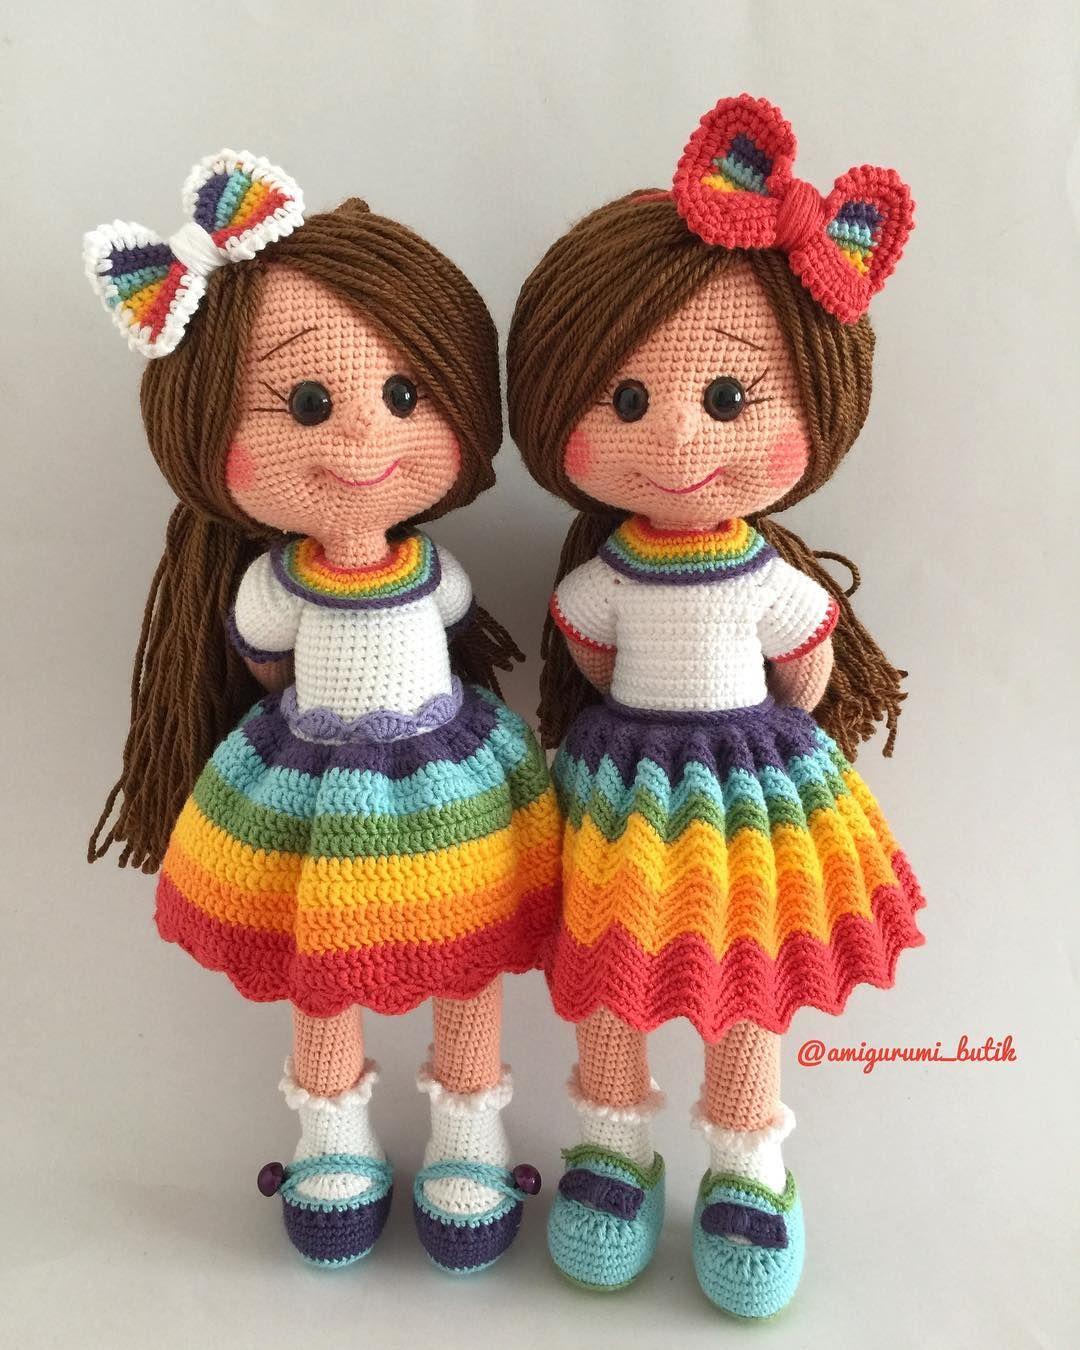 Amigurumi Hawaili Lana Doll Yapılışı-Amigurumi Free Pattern Doll ... | 1350x1080